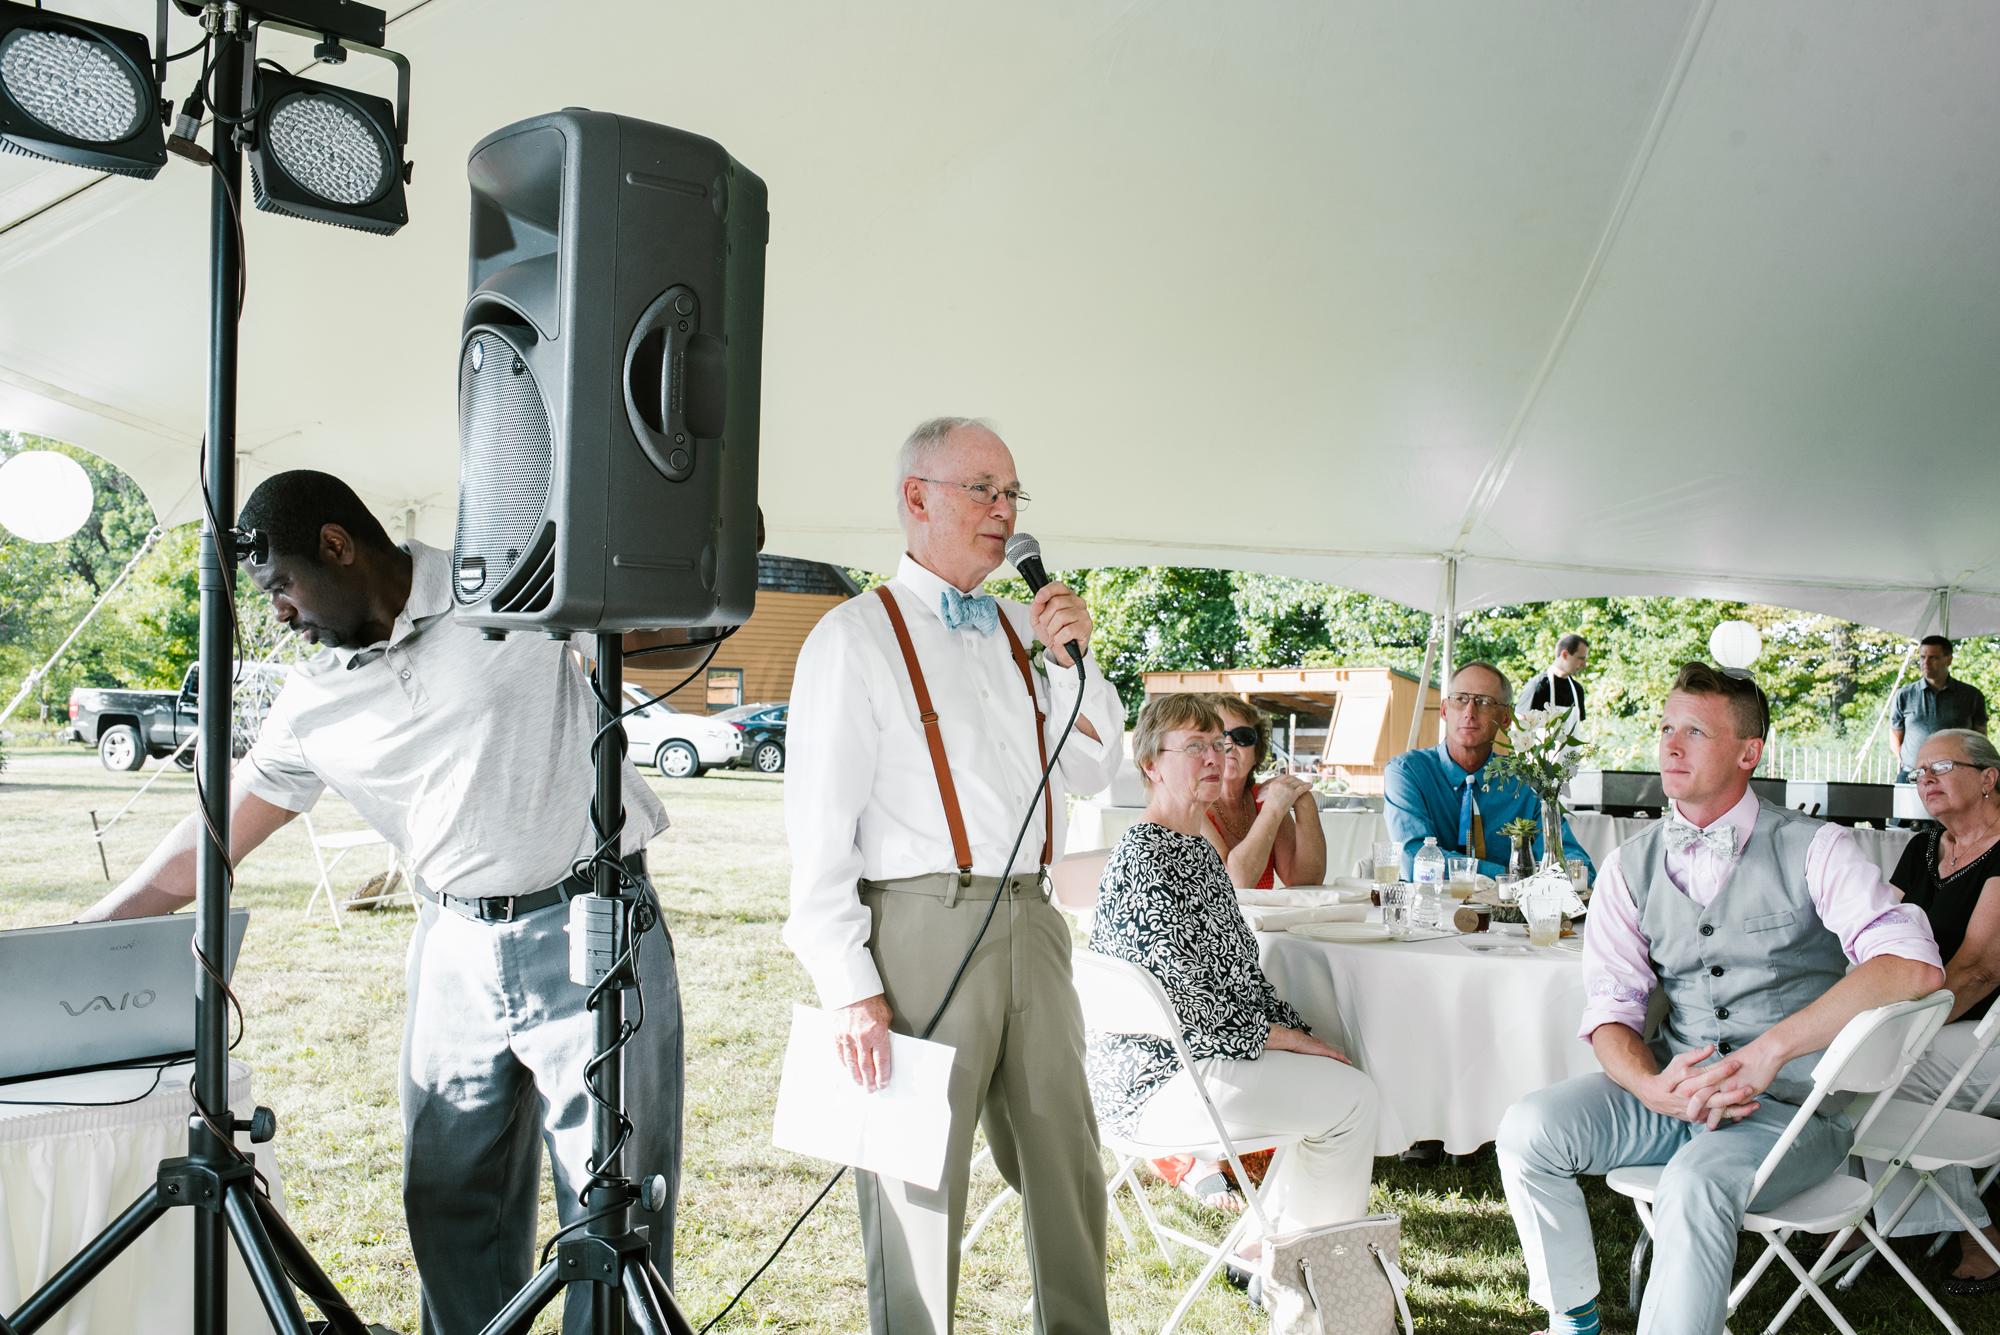 Quincy-Coldwater-Michigan-farm-wedding-photogapher-sydney-marie (380).jpg